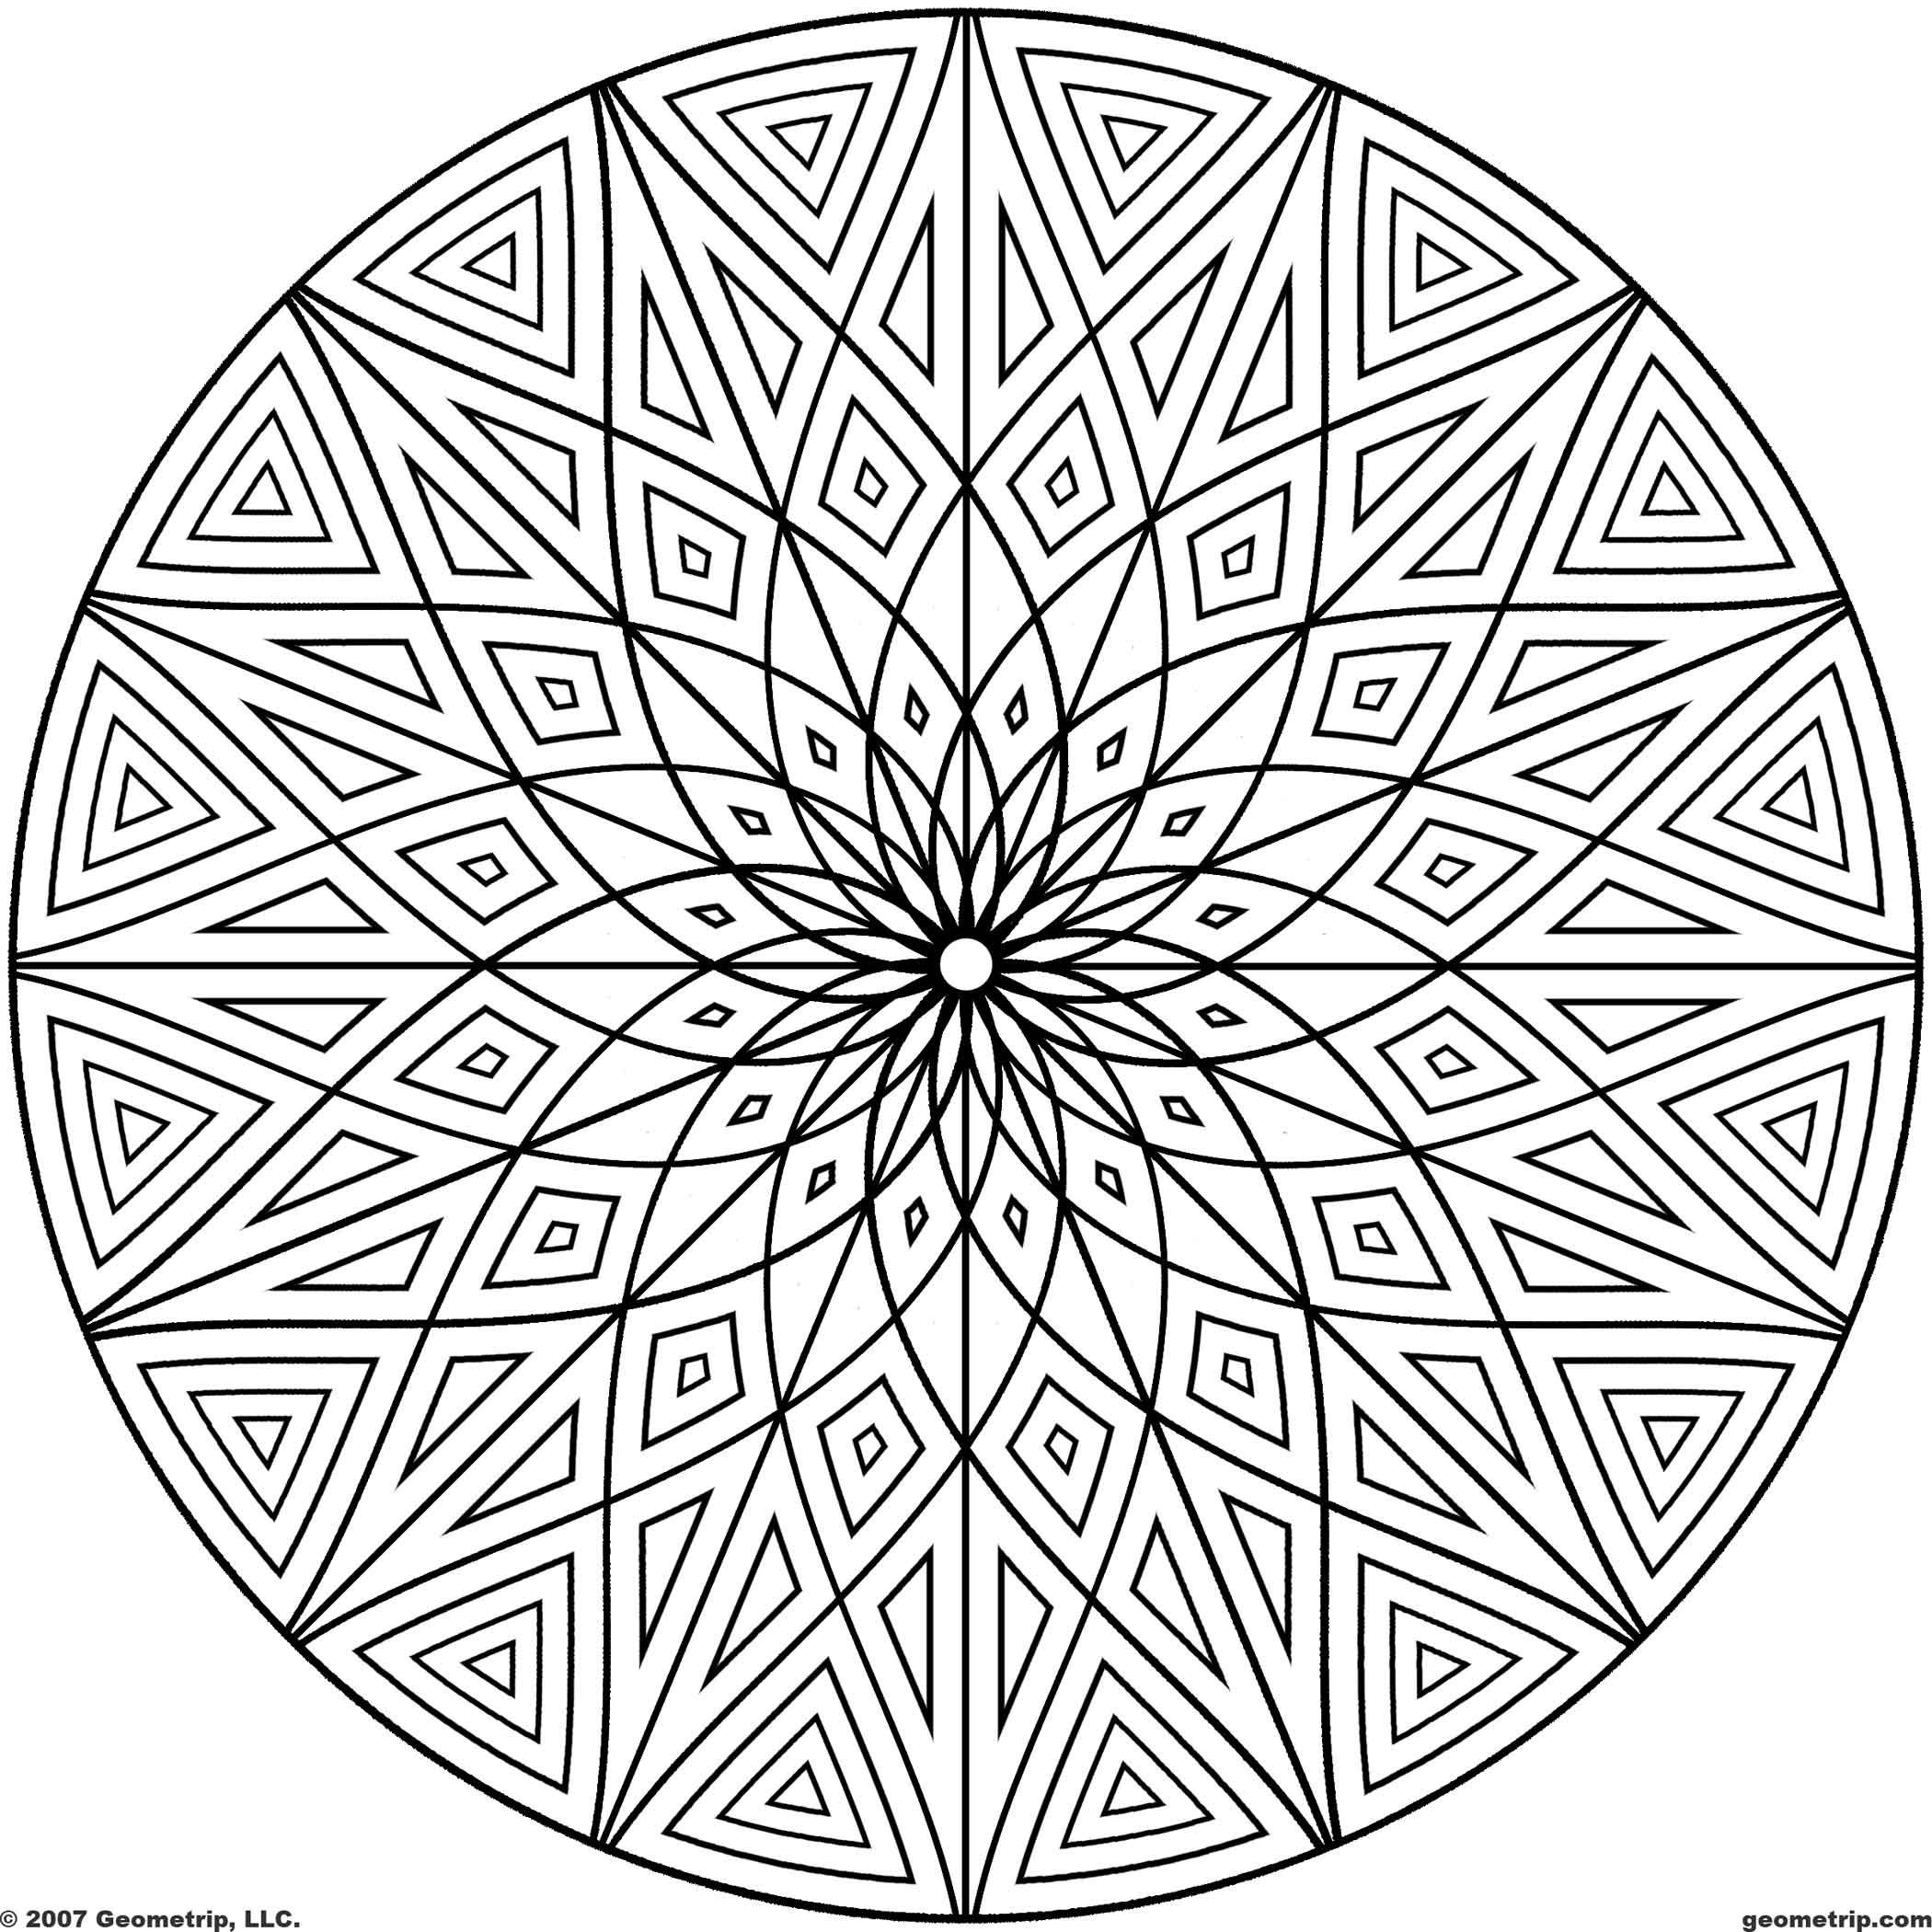 Printable geometric patterns geometrip com free geometric coloring designs circles